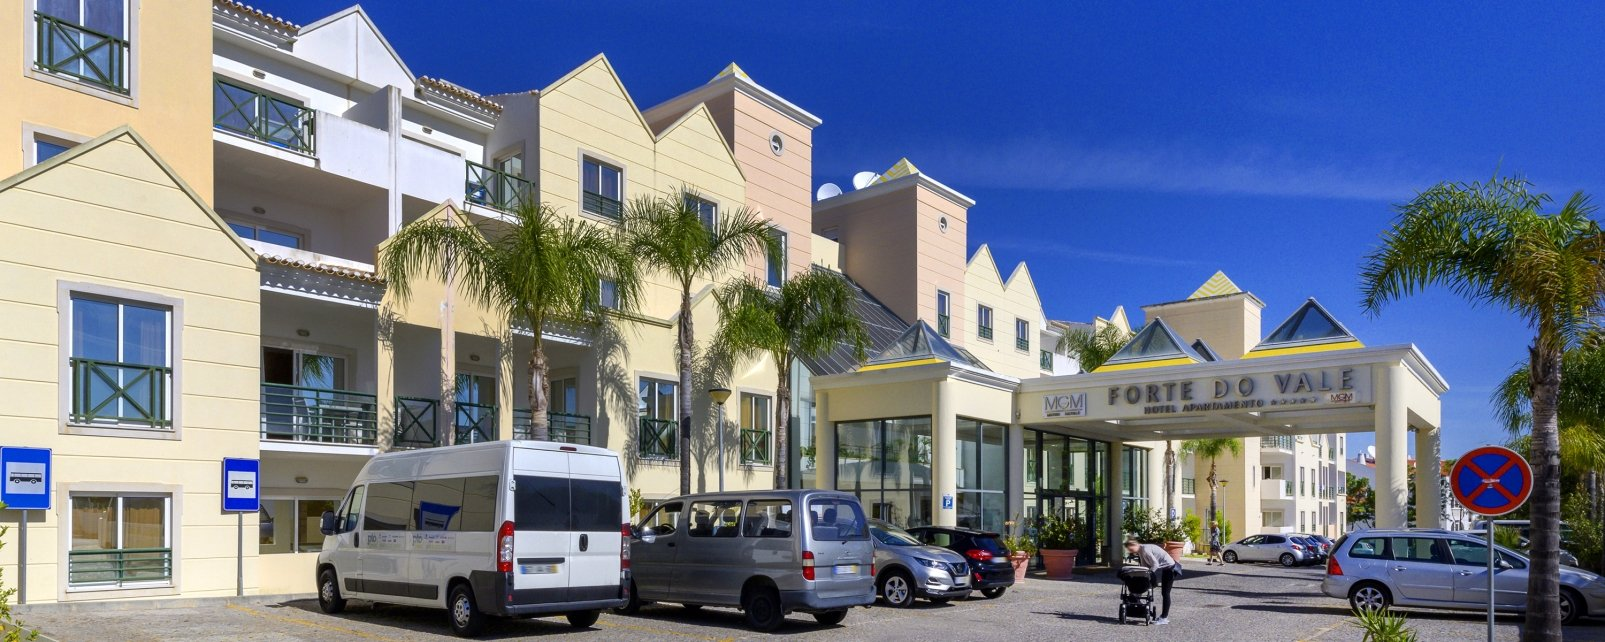 Hôtel Grand Muthu Forte Do Vale